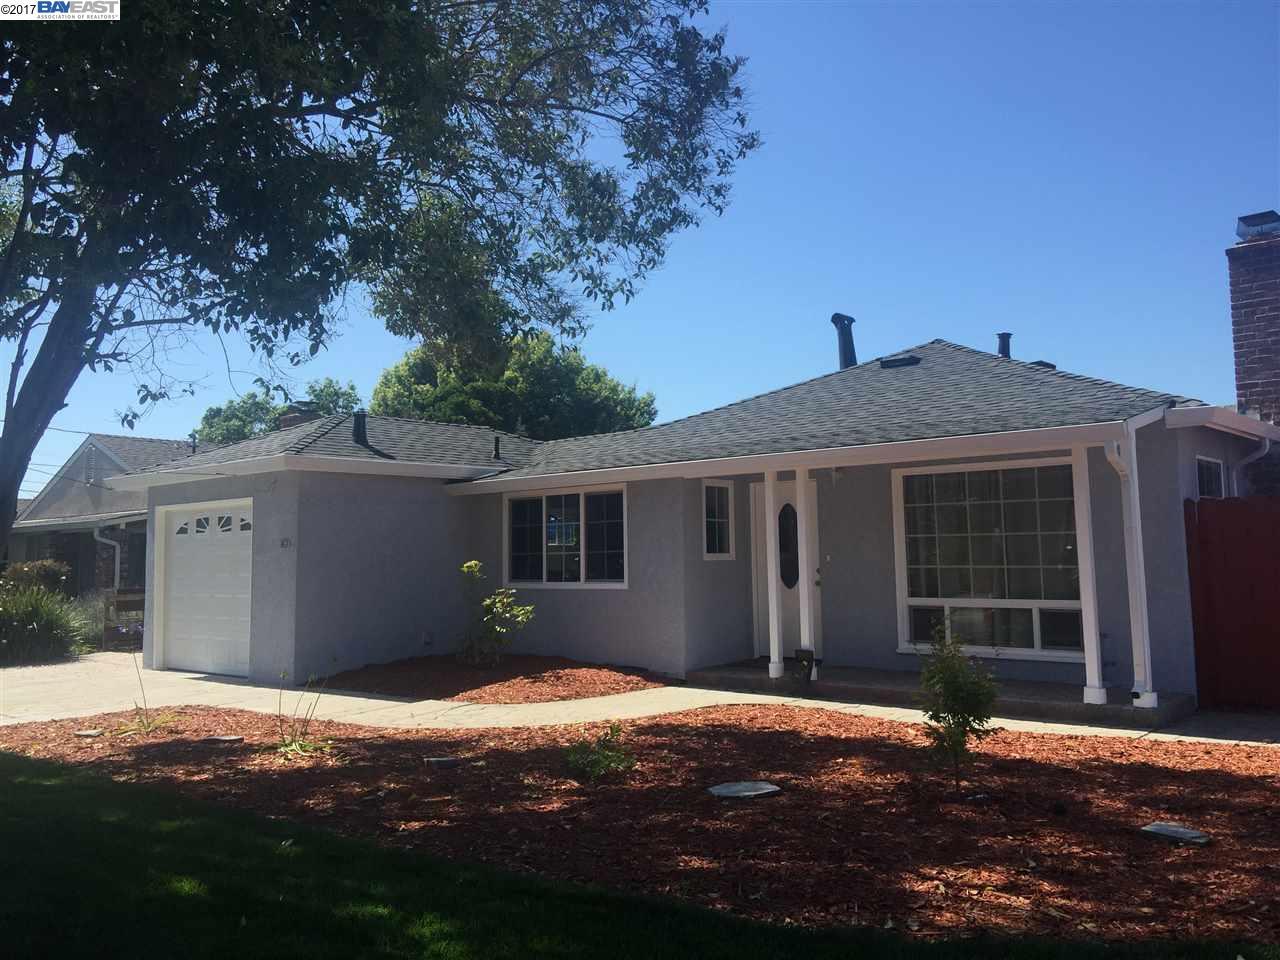 واحد منزل الأسرة للـ Sale في 1203 Via Coralla San Lorenzo, California 94580 United States